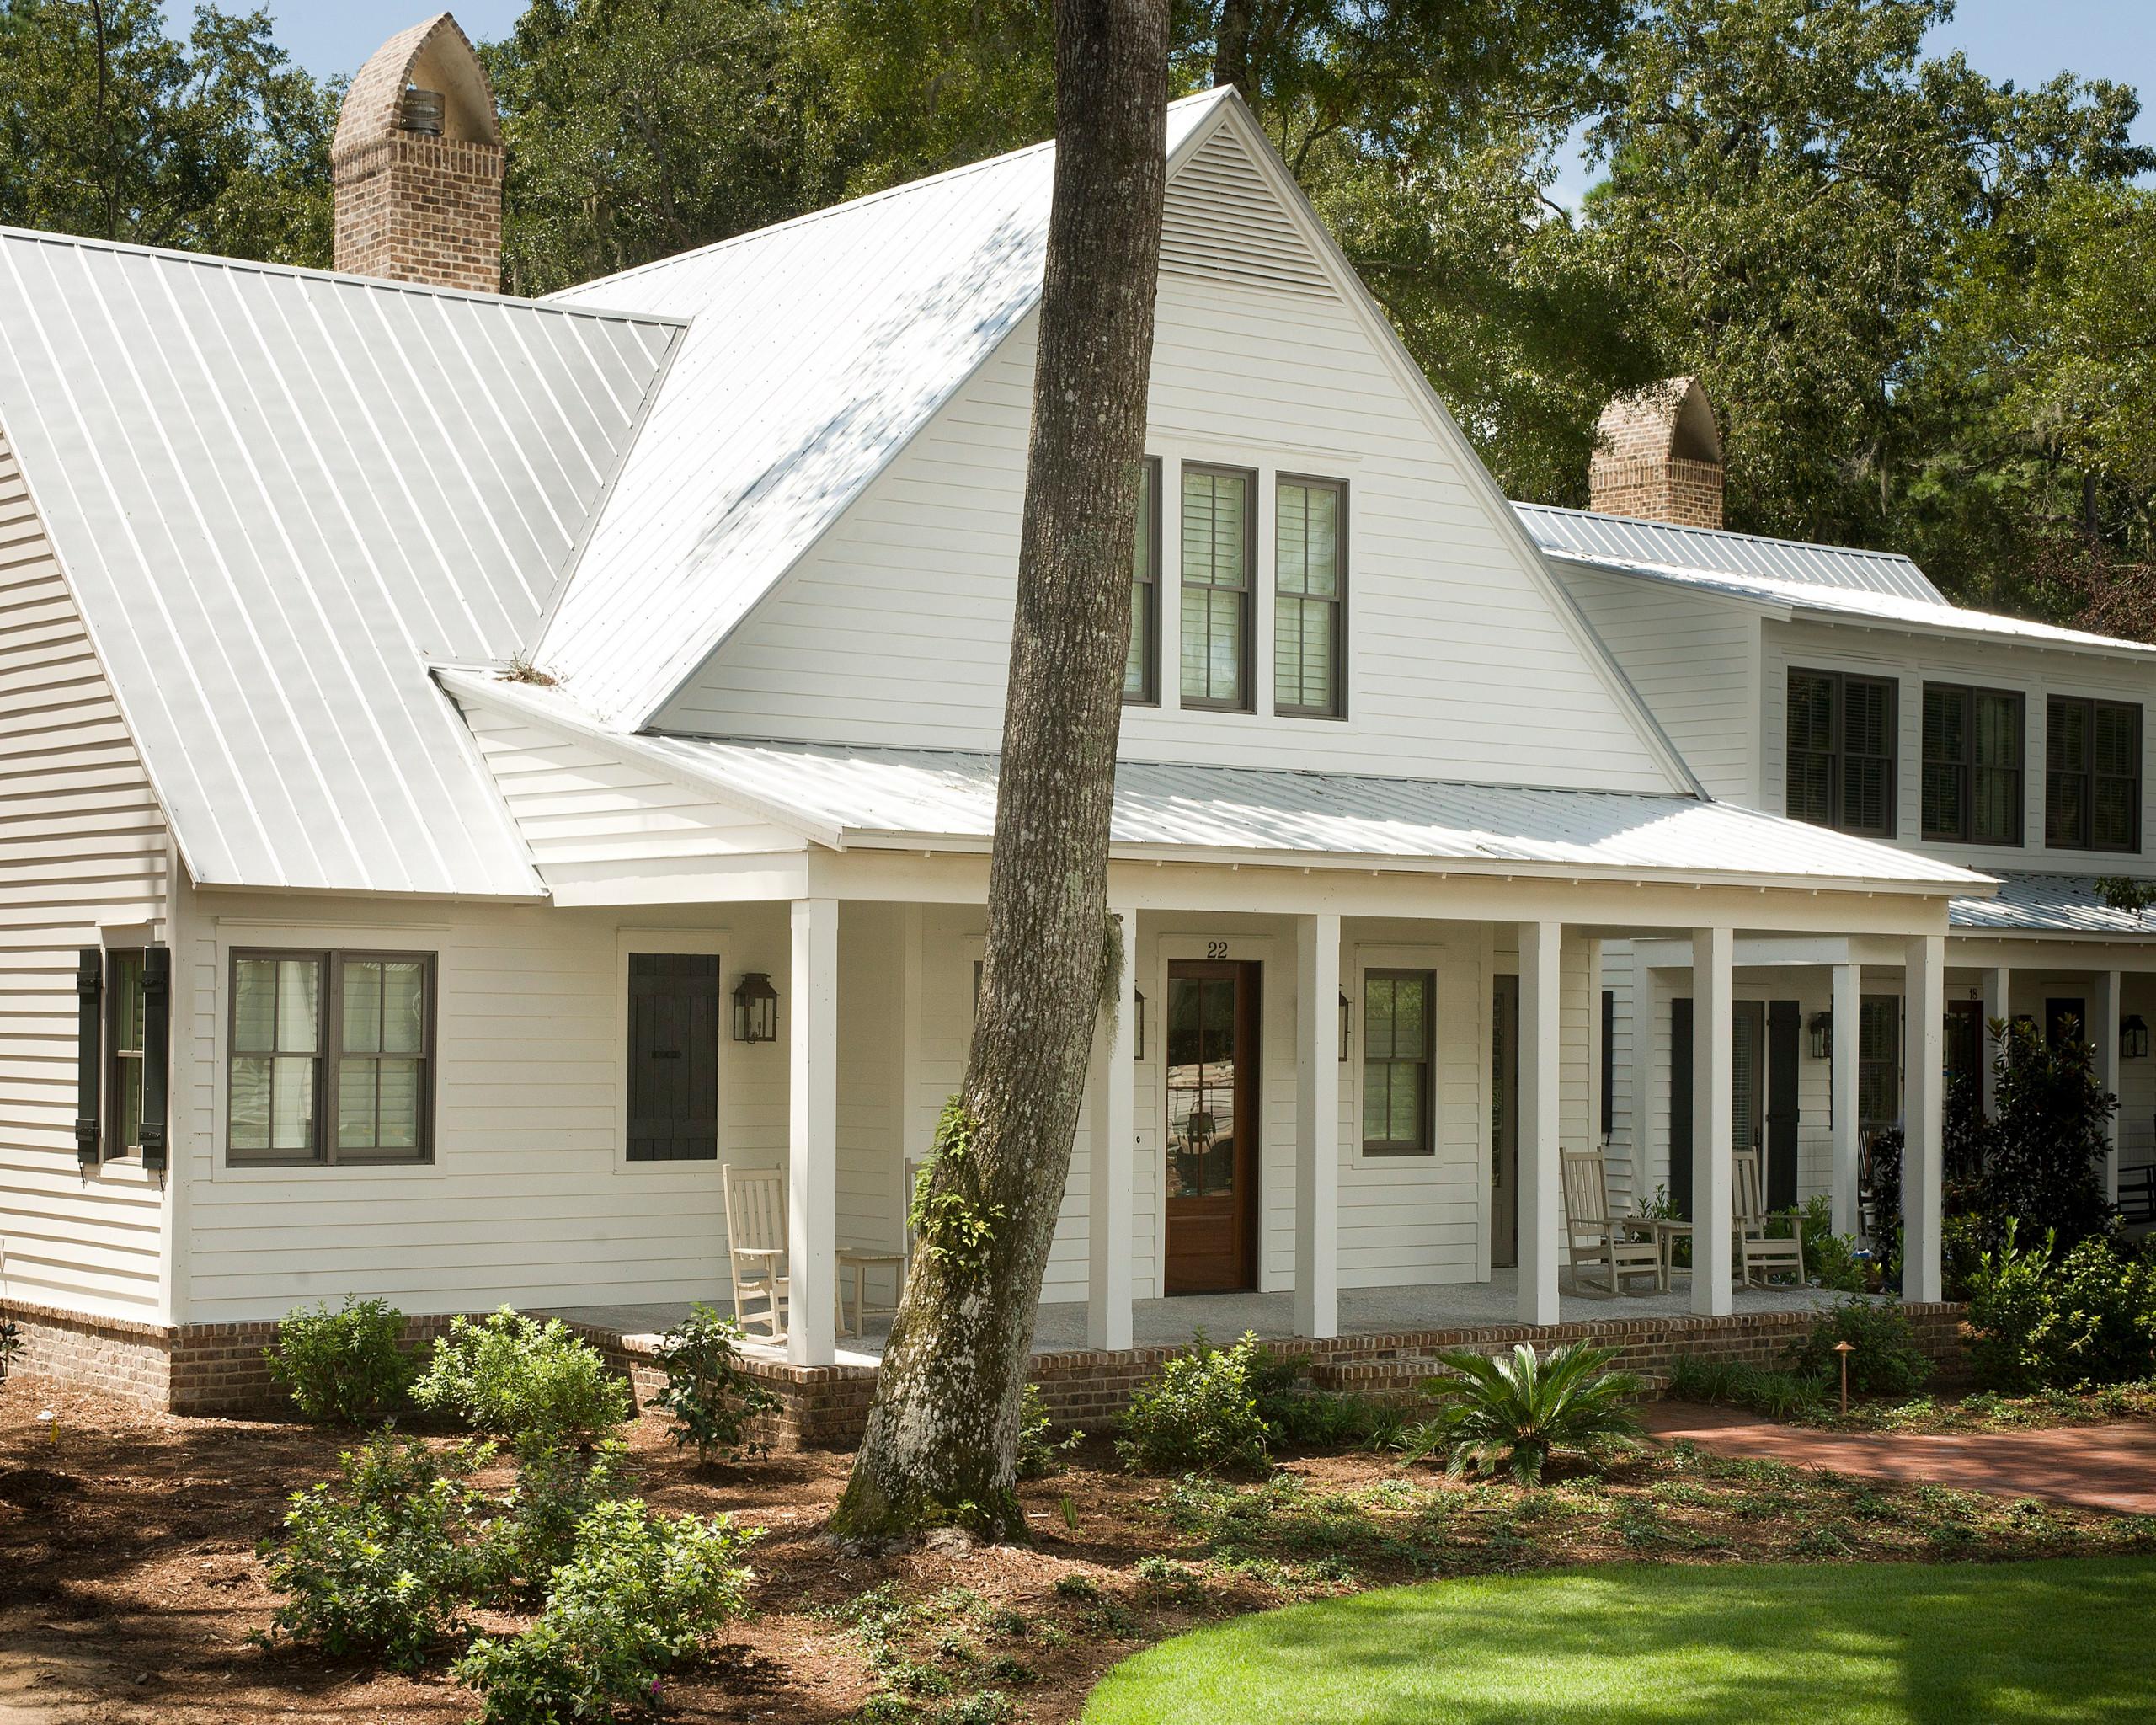 Wilson Cottages